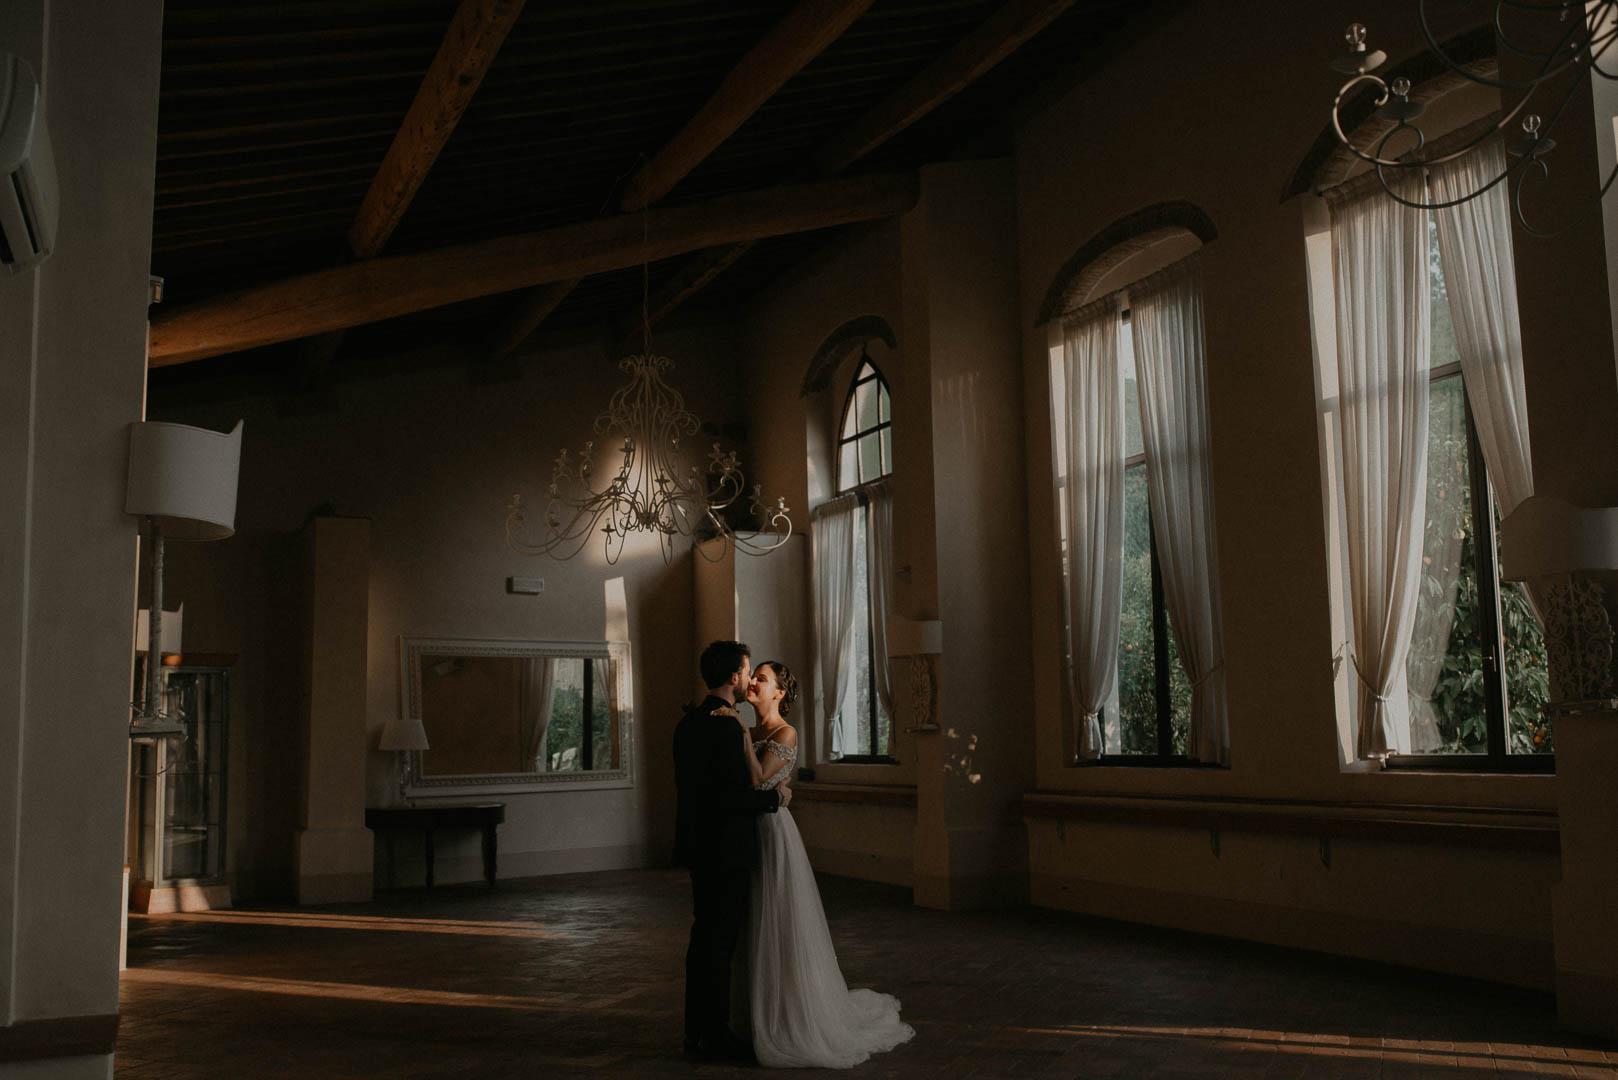 wedding-photographer-destination-fineart-bespoke-reportage-tuscany-villascorzi-vivianeizzo-spazio46-122